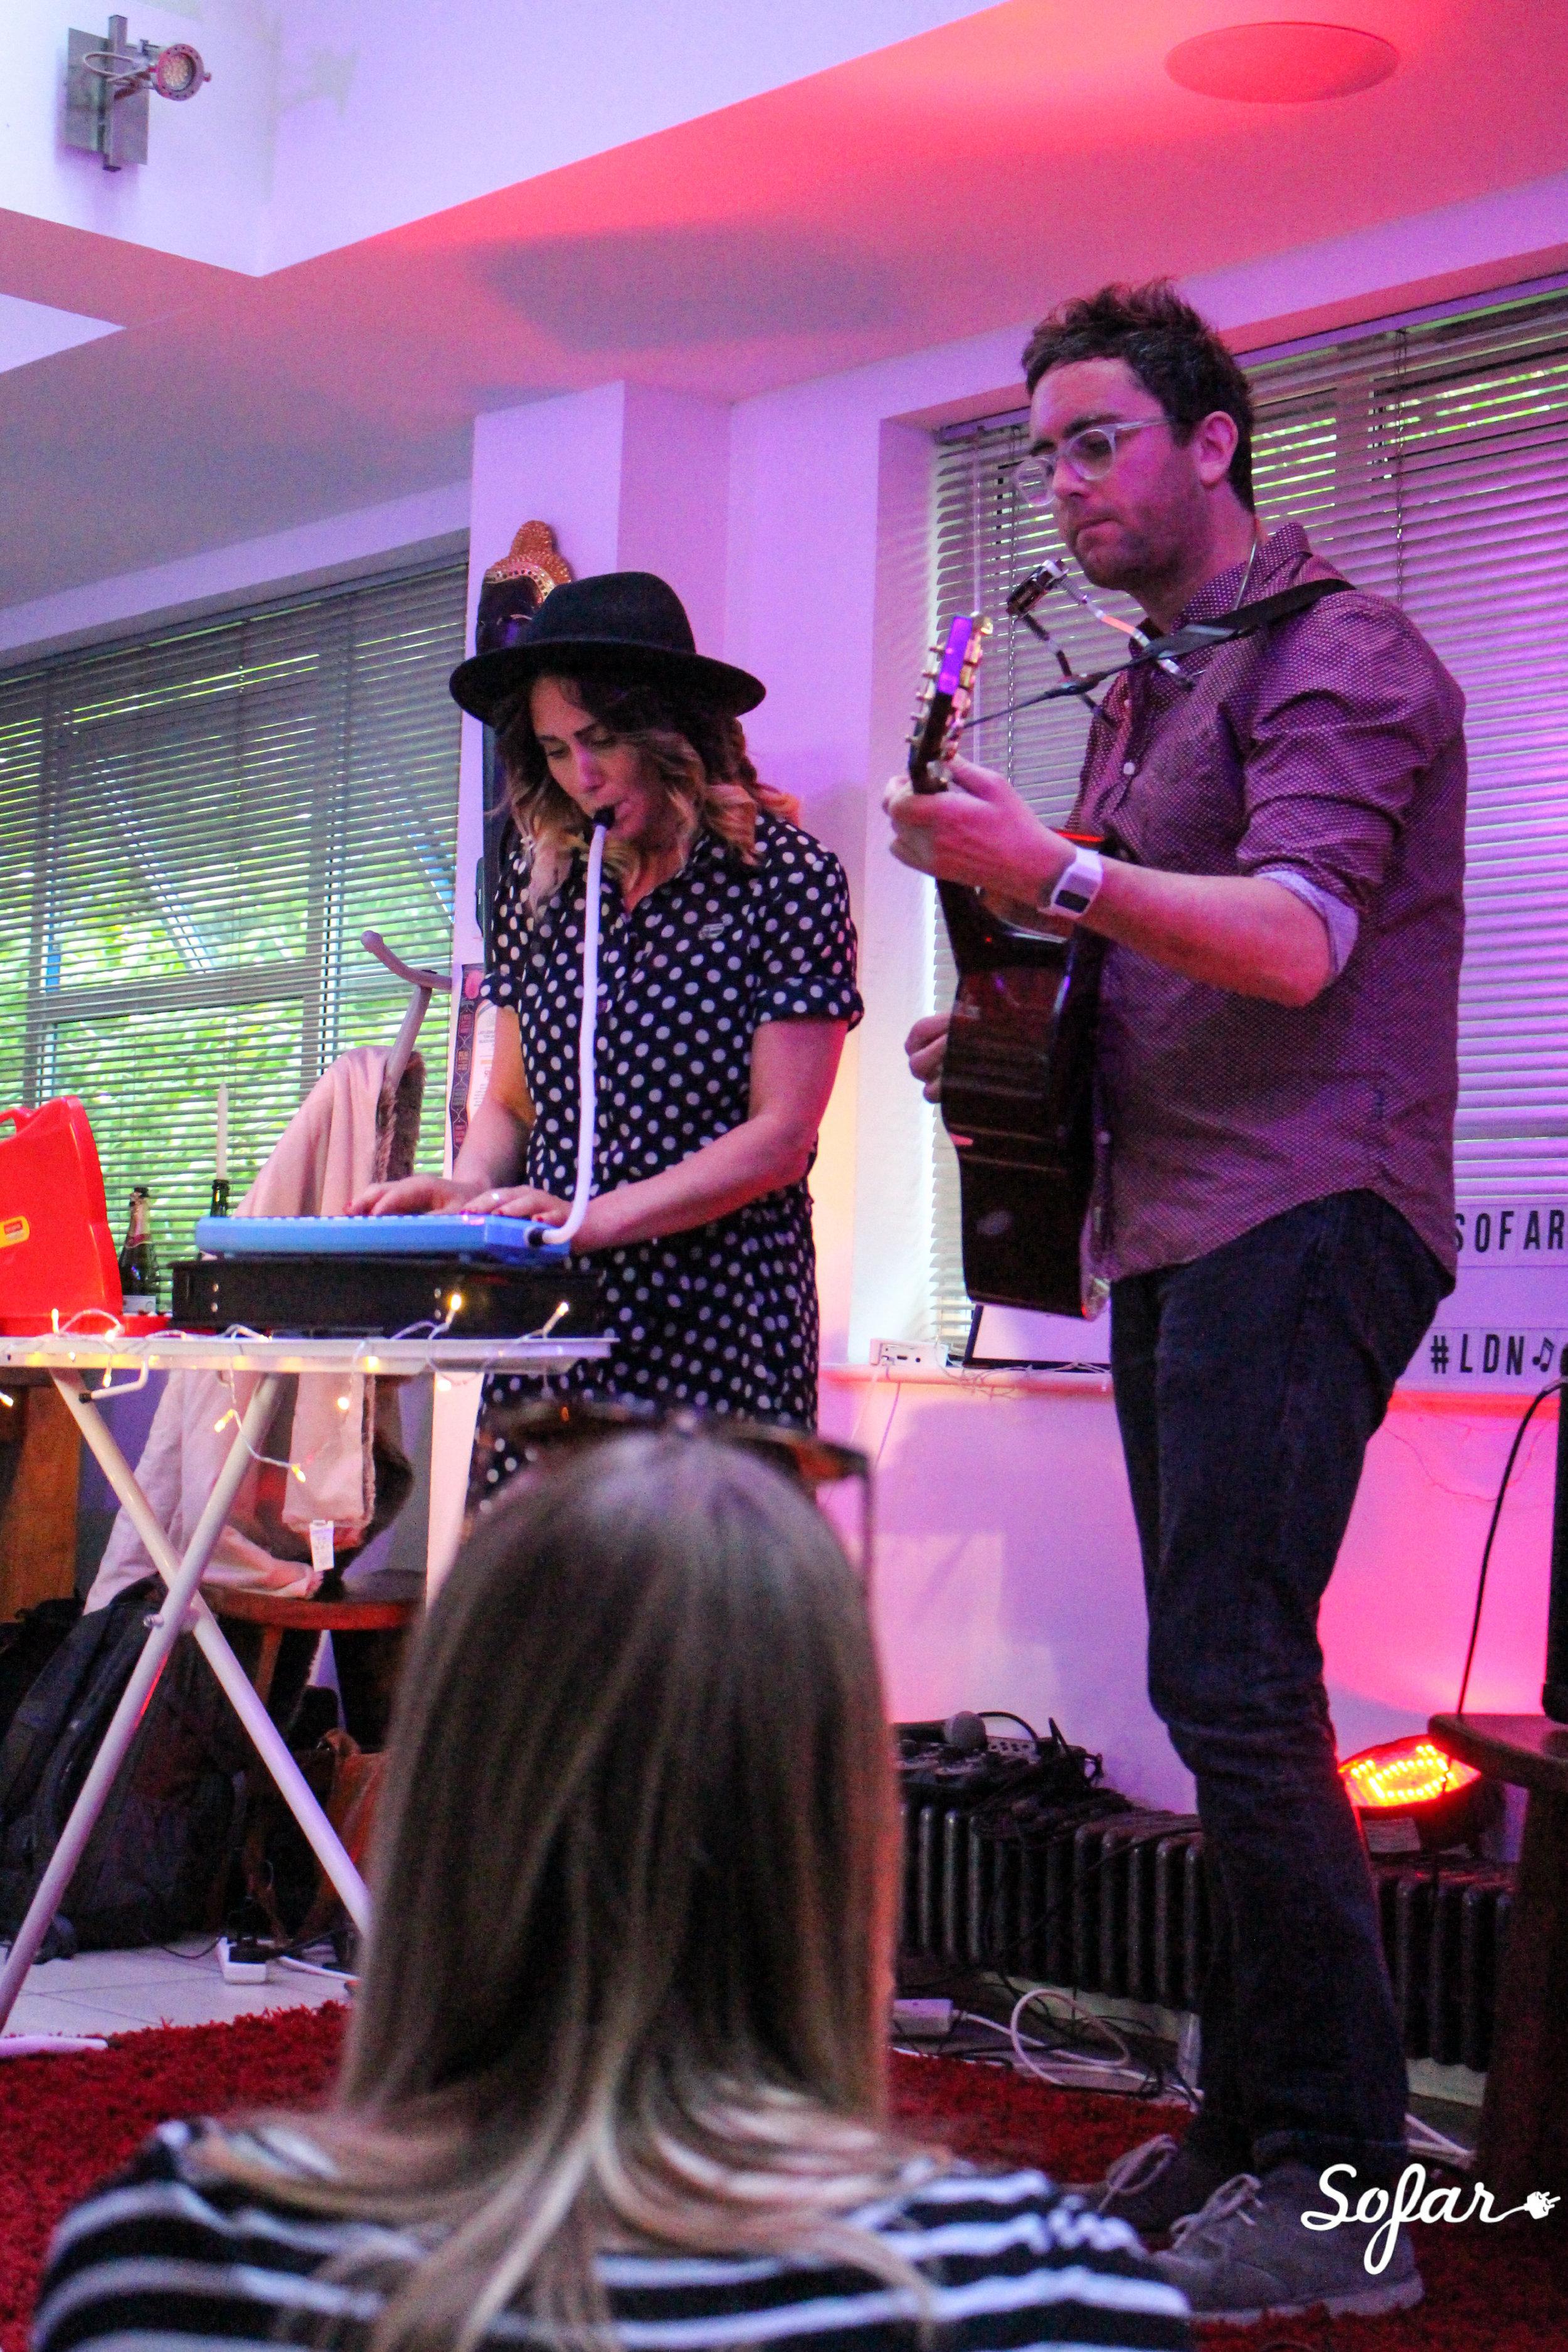 Mahoney & The Moment Live at Sofar Sounds London